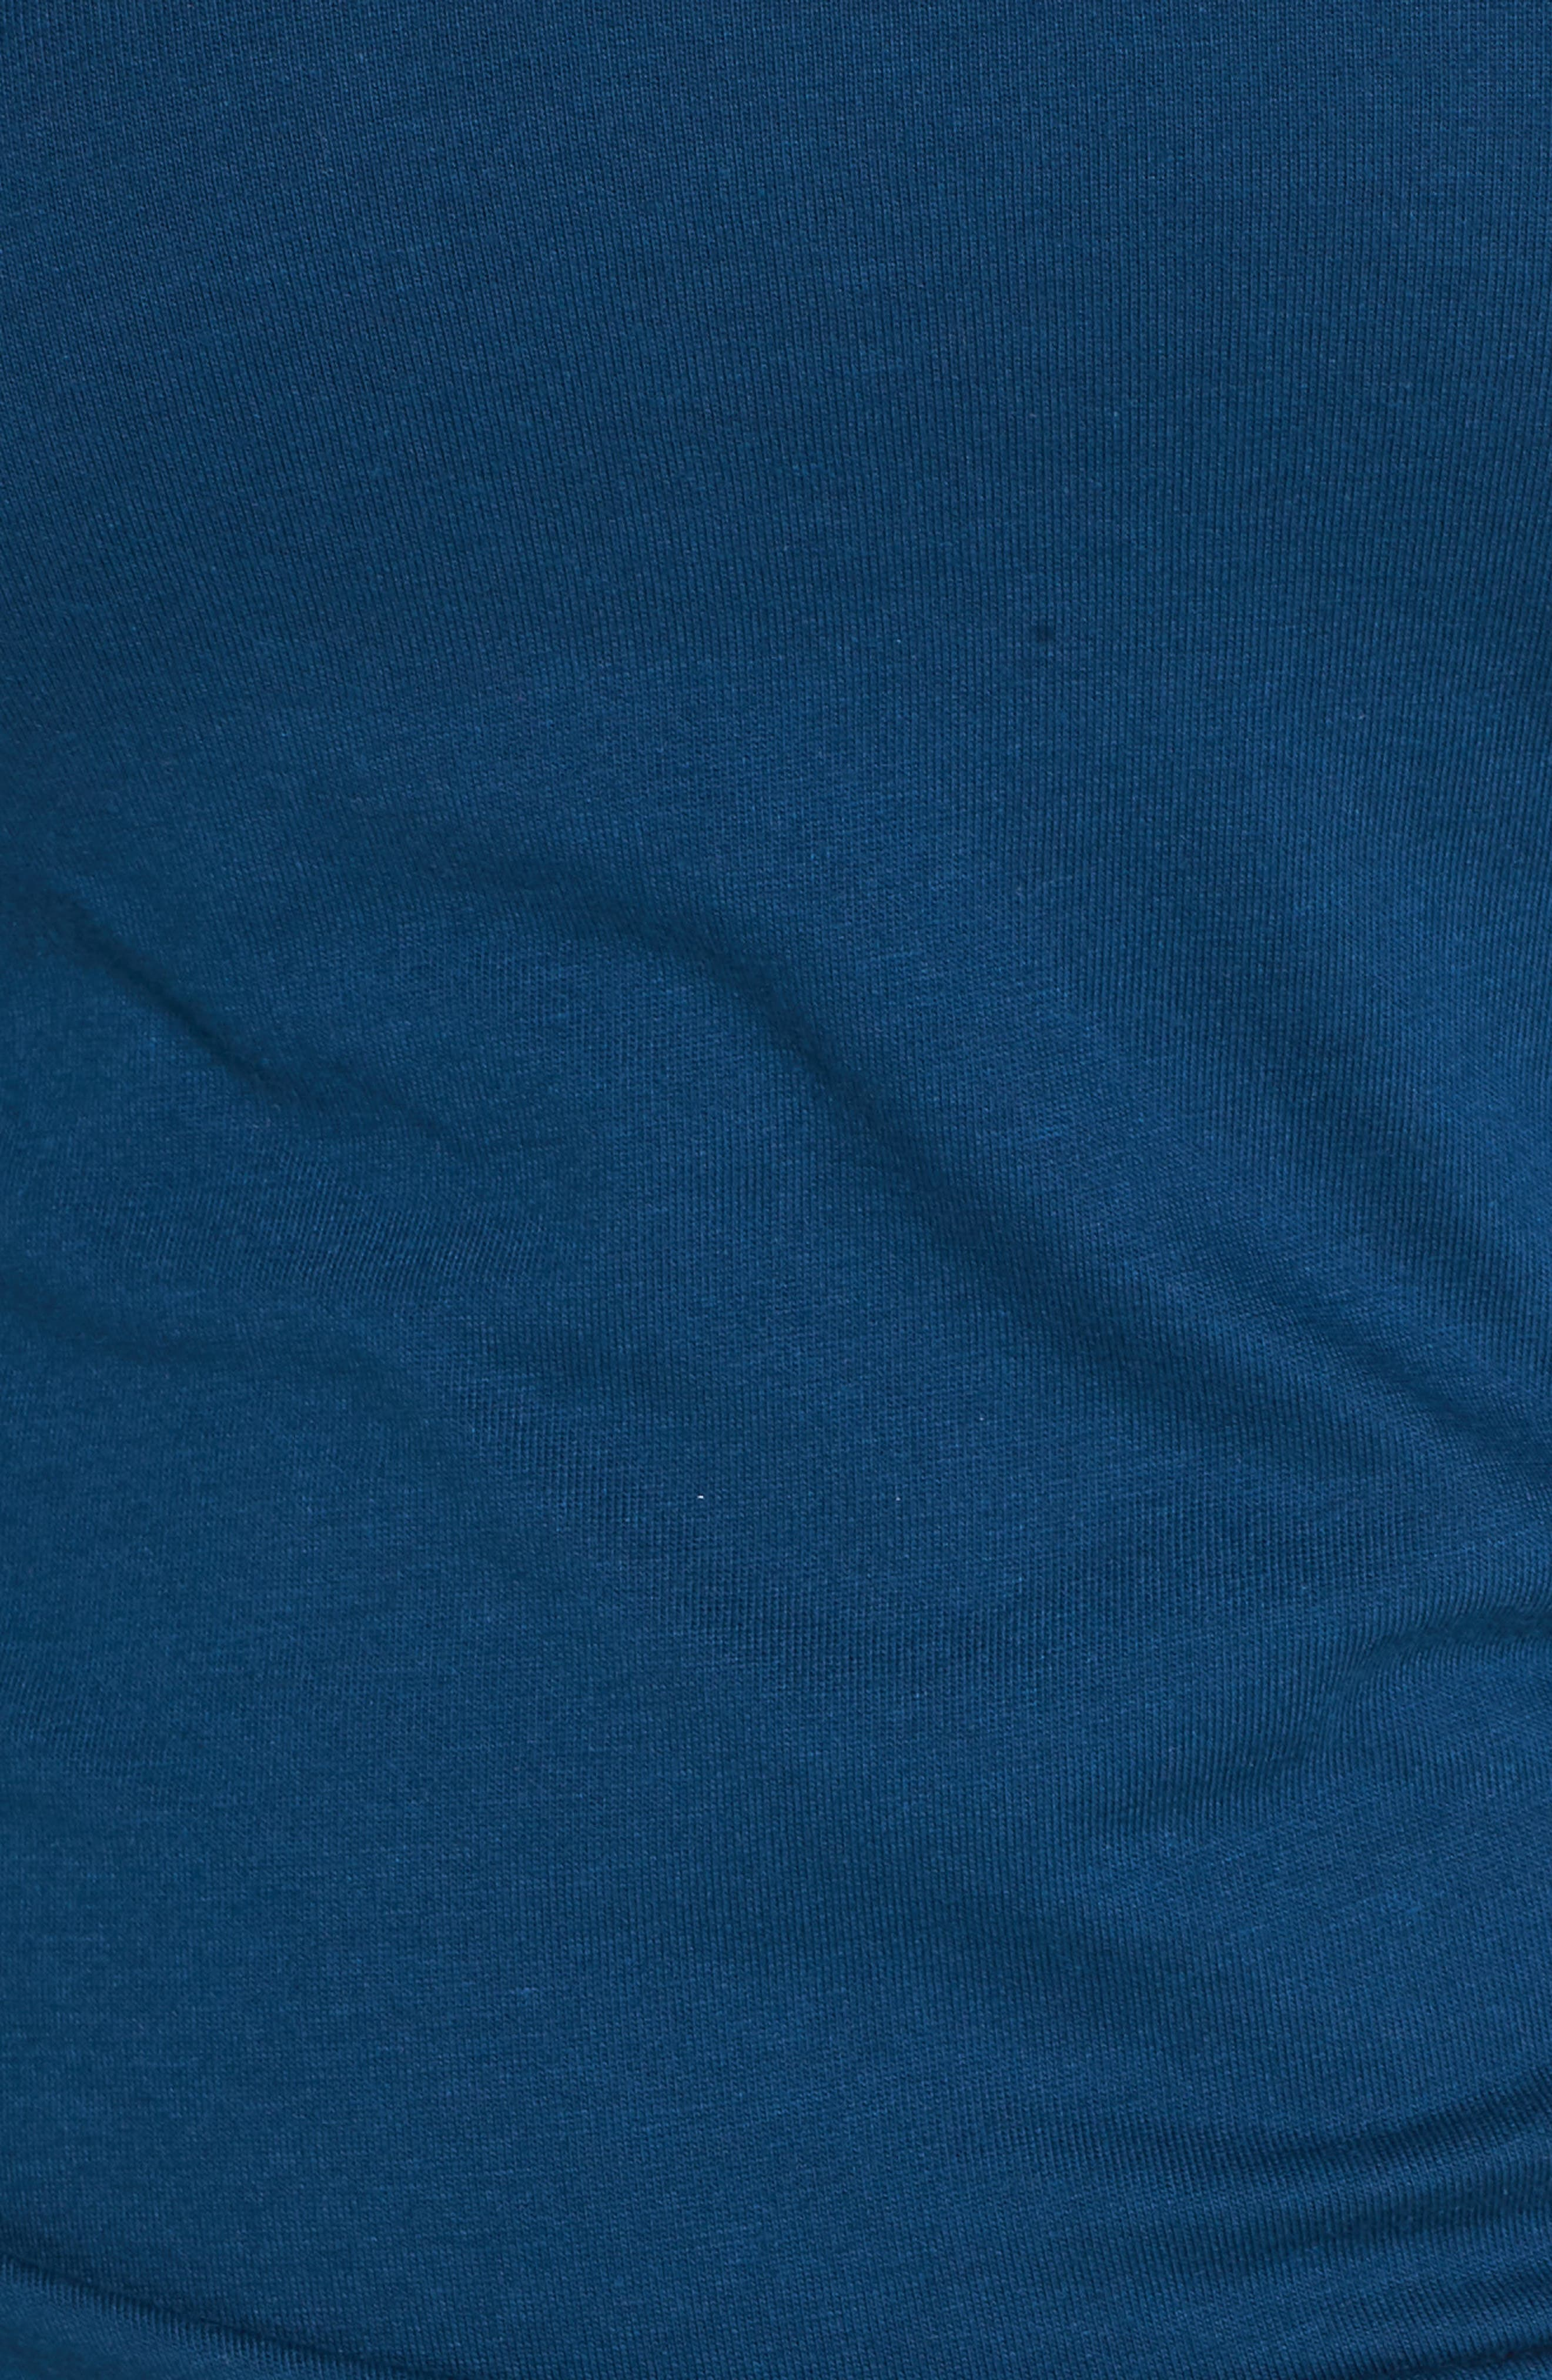 Ruched Sheath Dress,                             Alternate thumbnail 6, color,                             BLUE AURORA